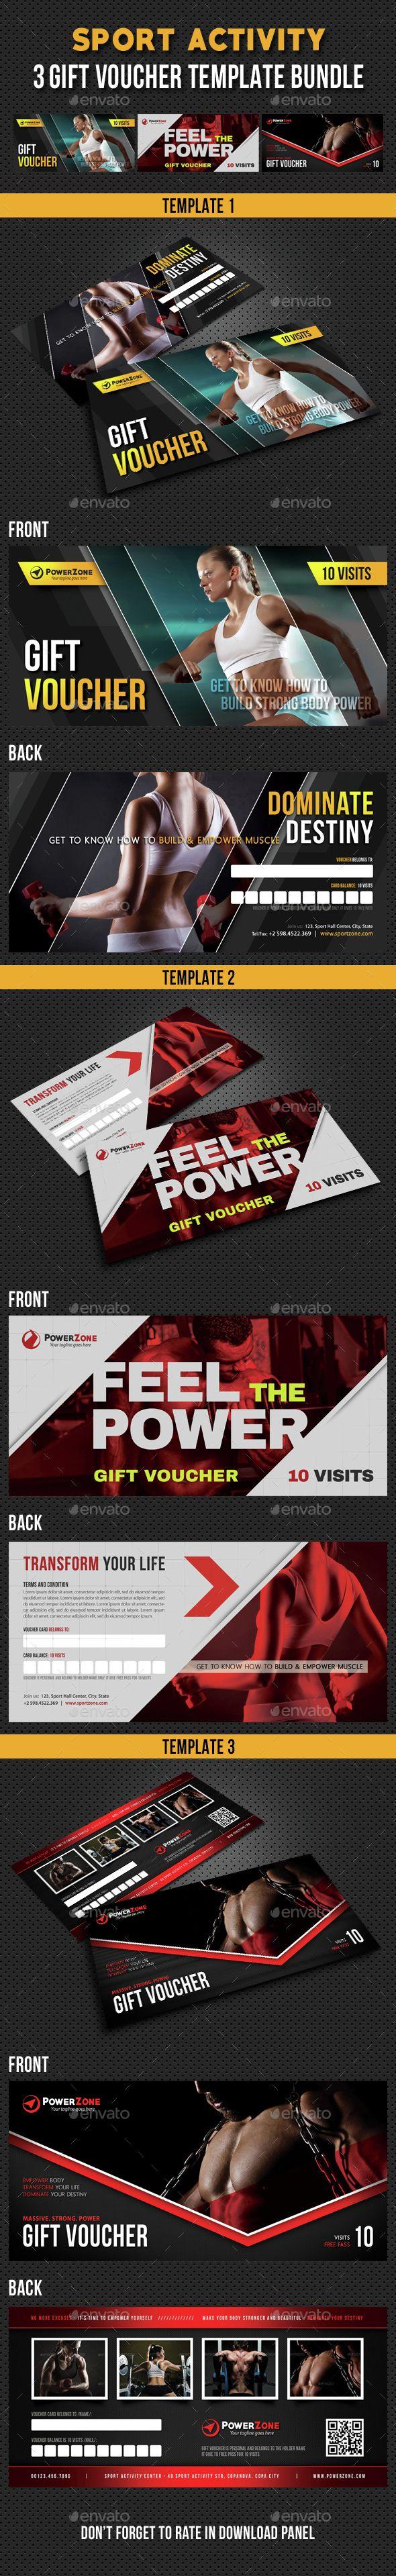 3 in 1 Sport Activity Gift Voucher Bundle 04